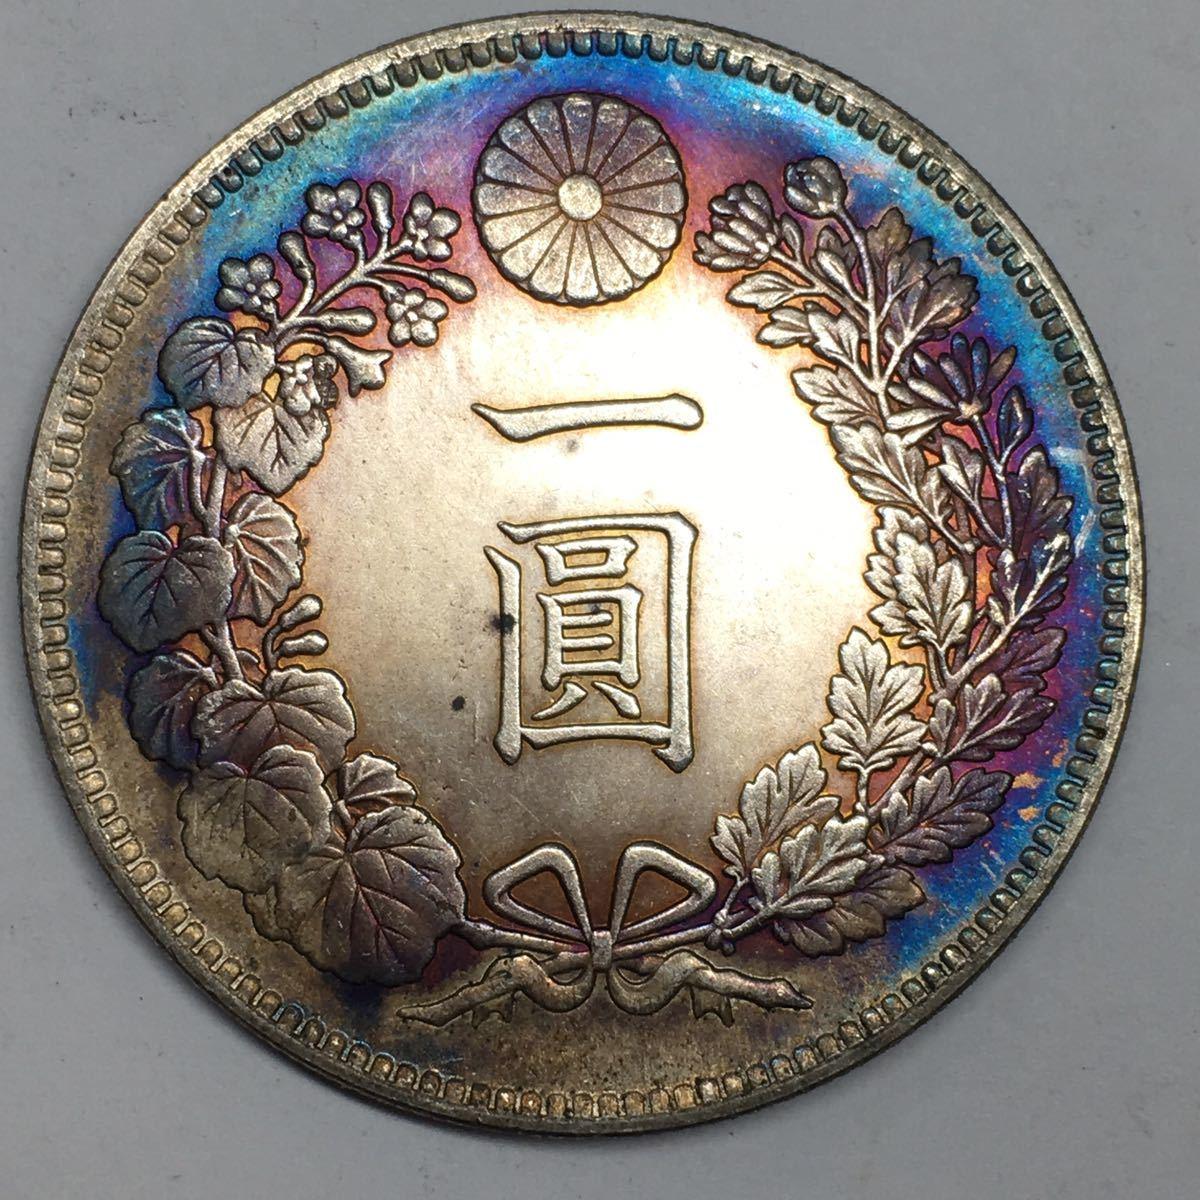 ES5-305 明治八年一円銀貨 日本古銭 量目26.45_画像1